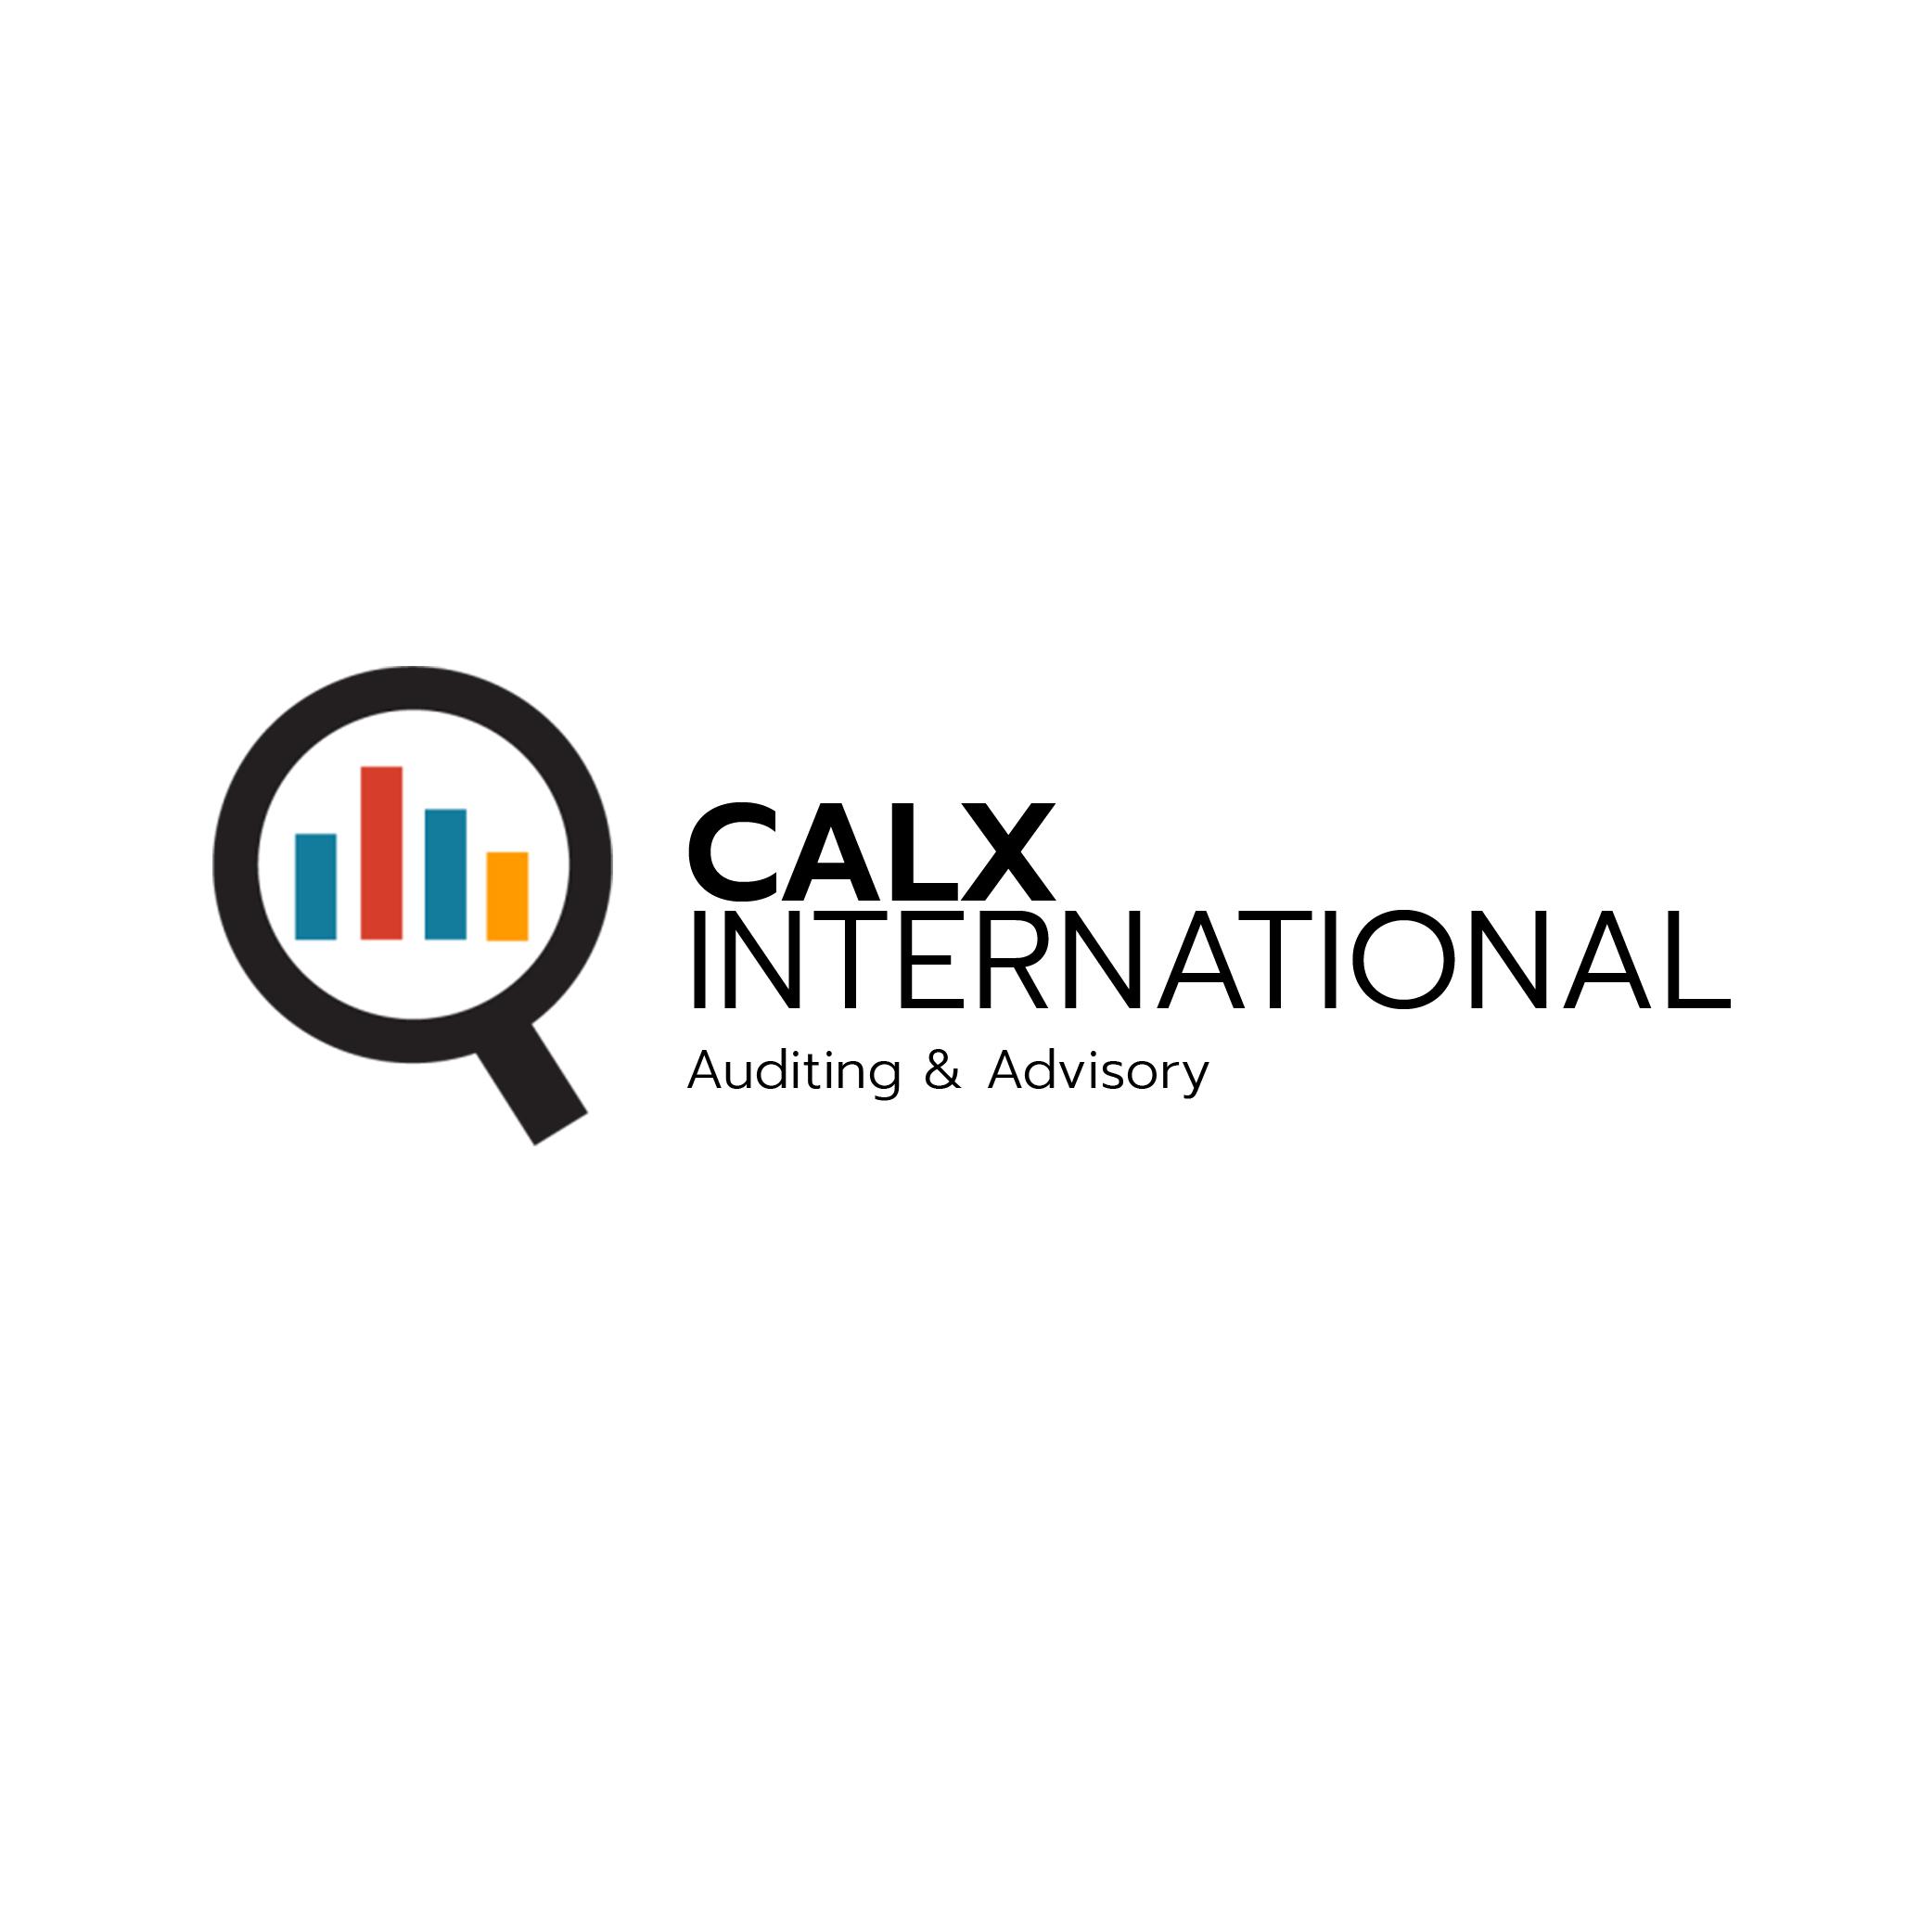 Calx International Auditing